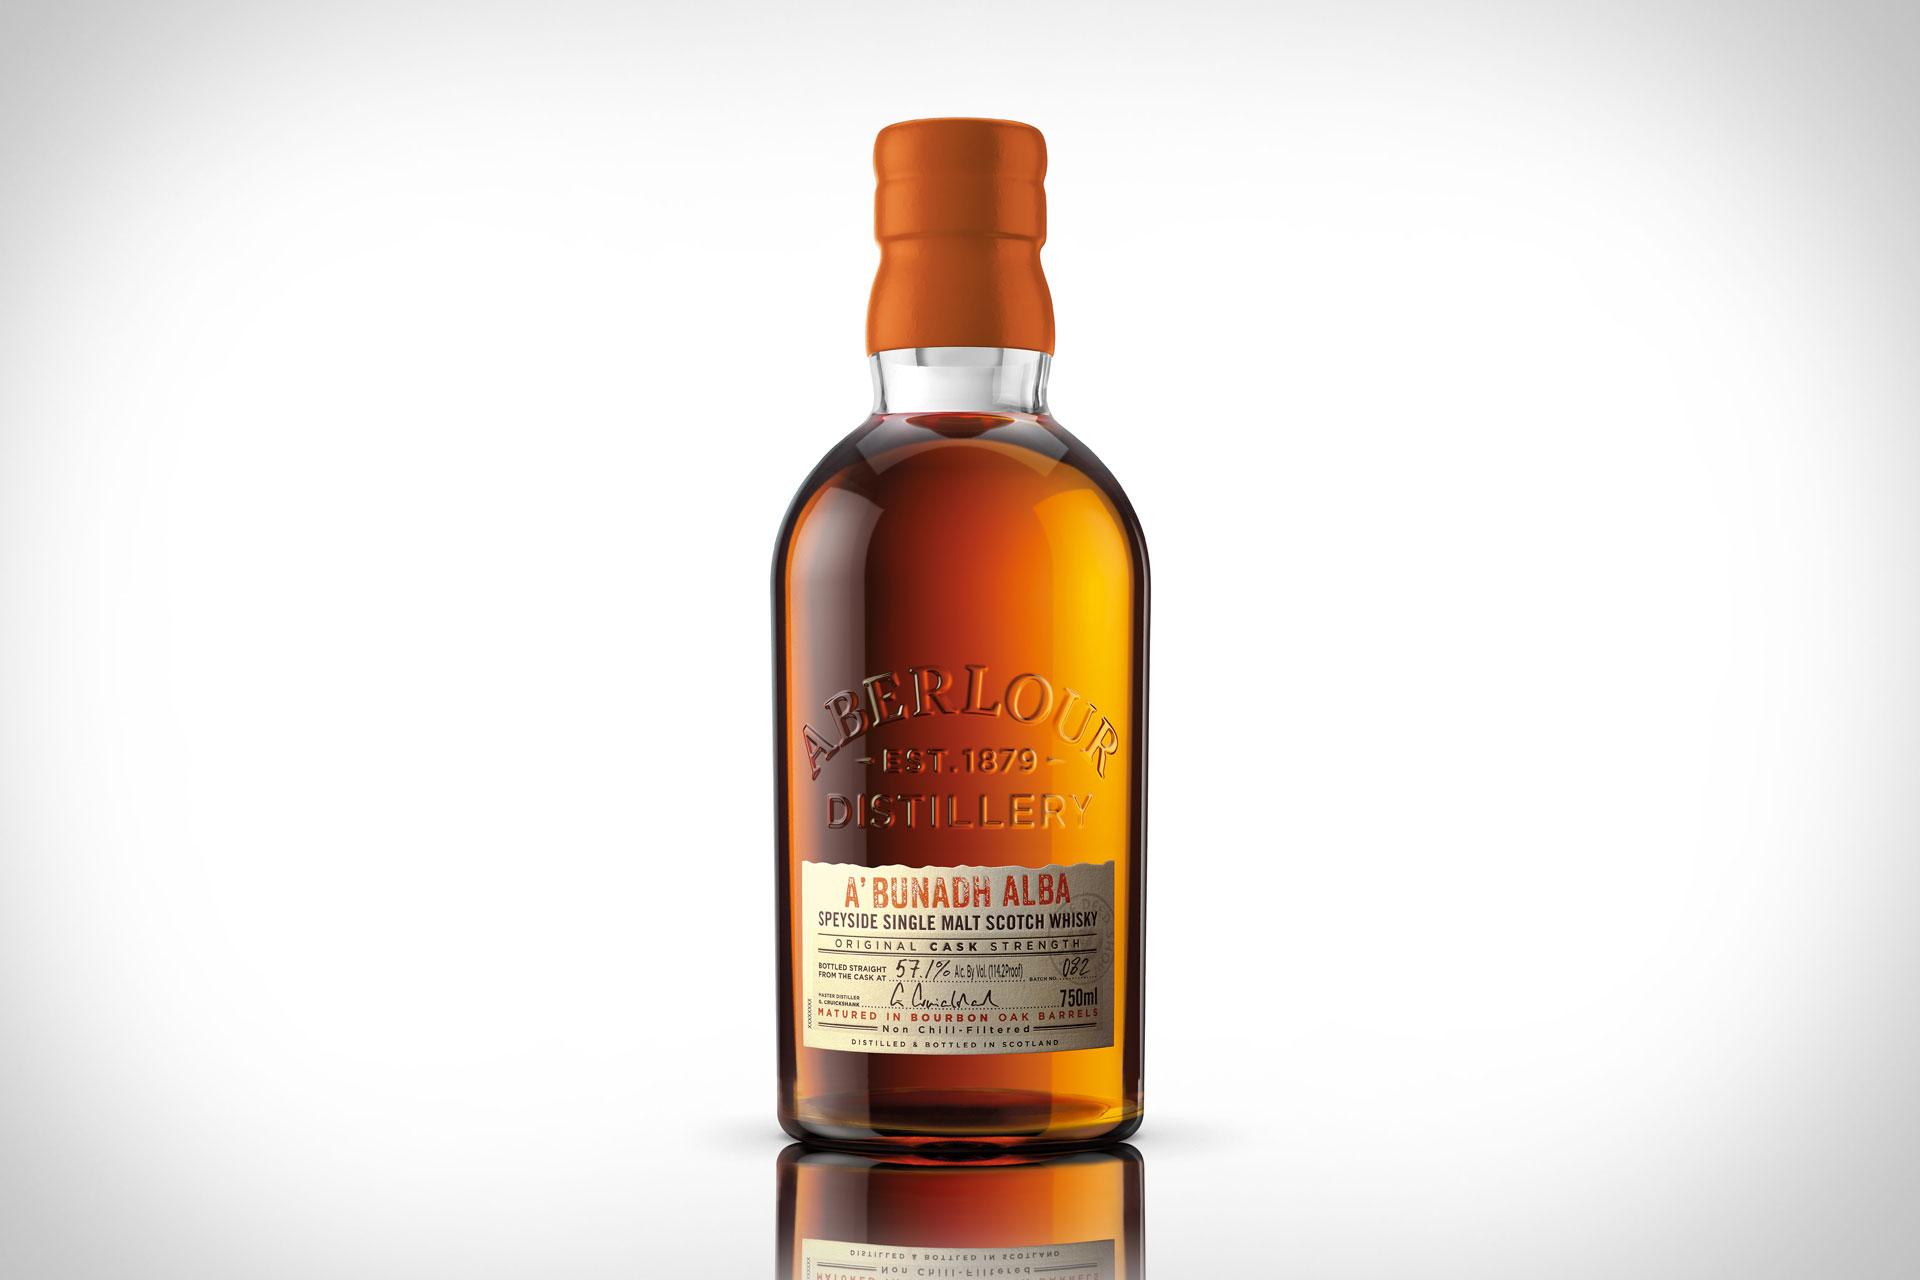 Aberlour A'bunadh Alba Scotch Whisky